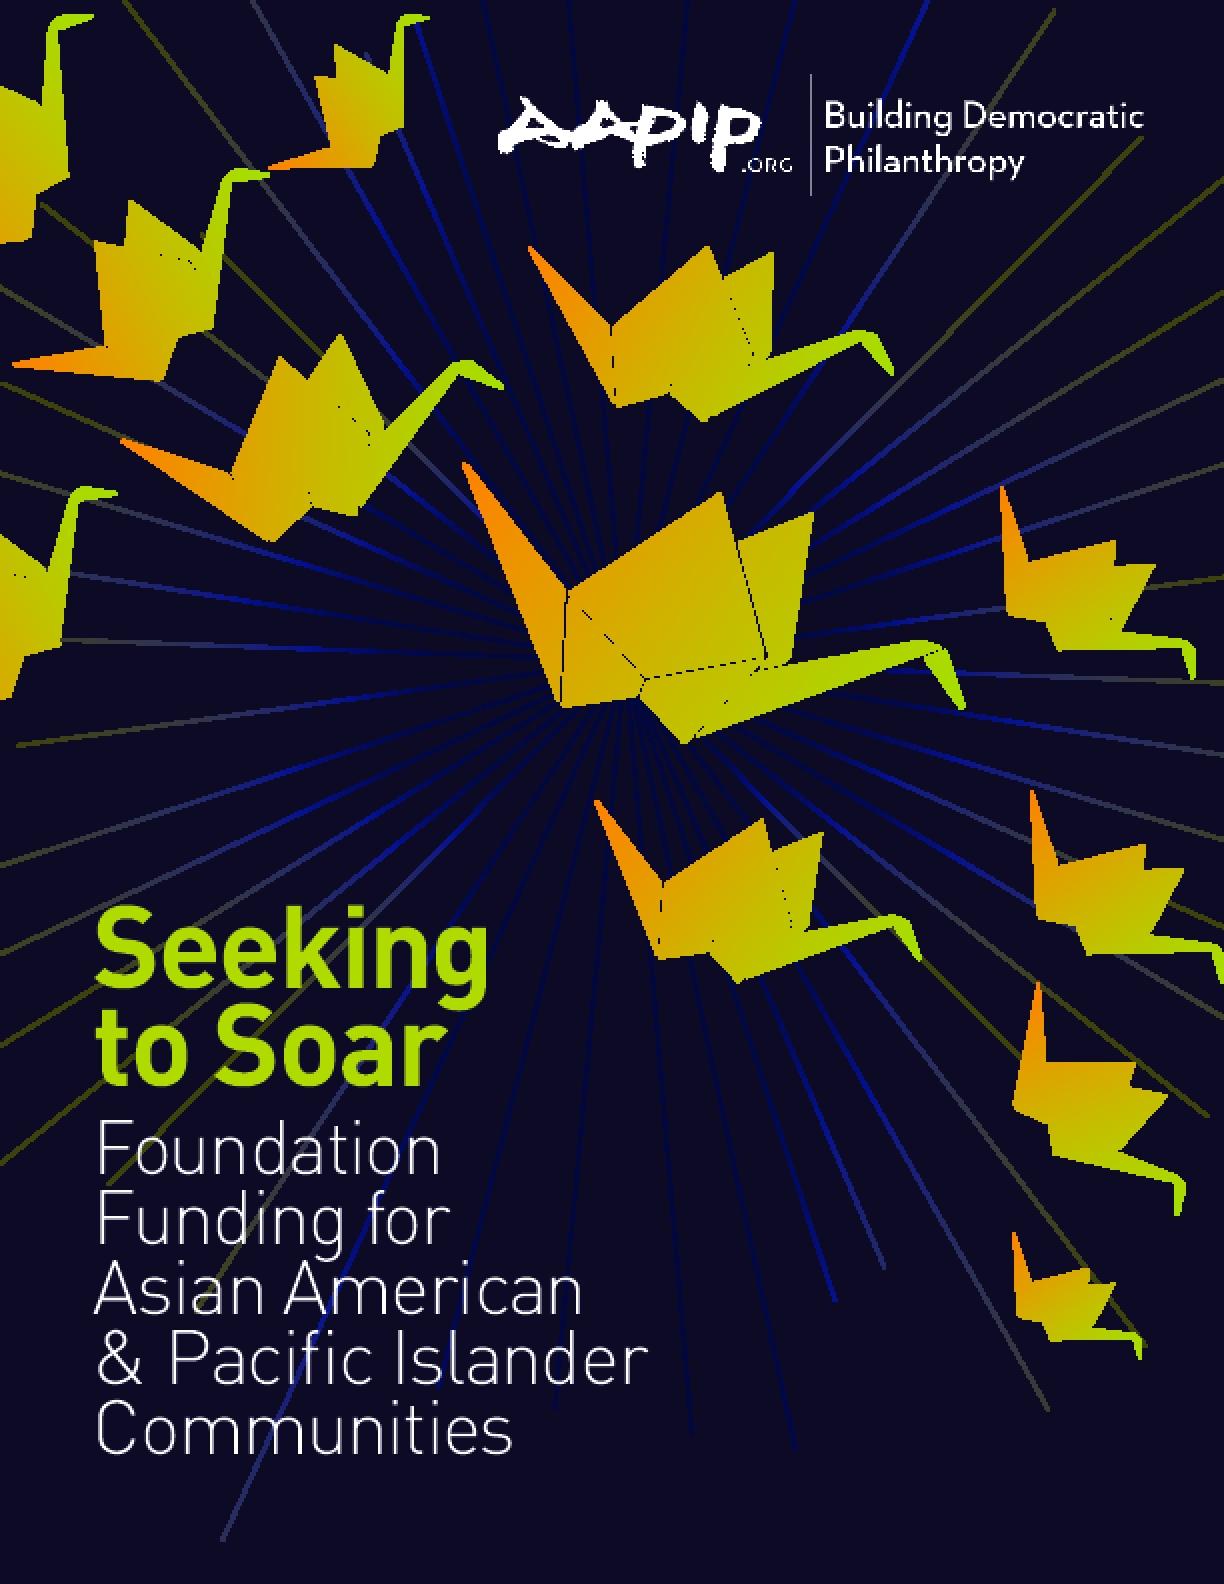 Seeking to Soar: Foundation Funding for Asian American & Pacific Islander Communities